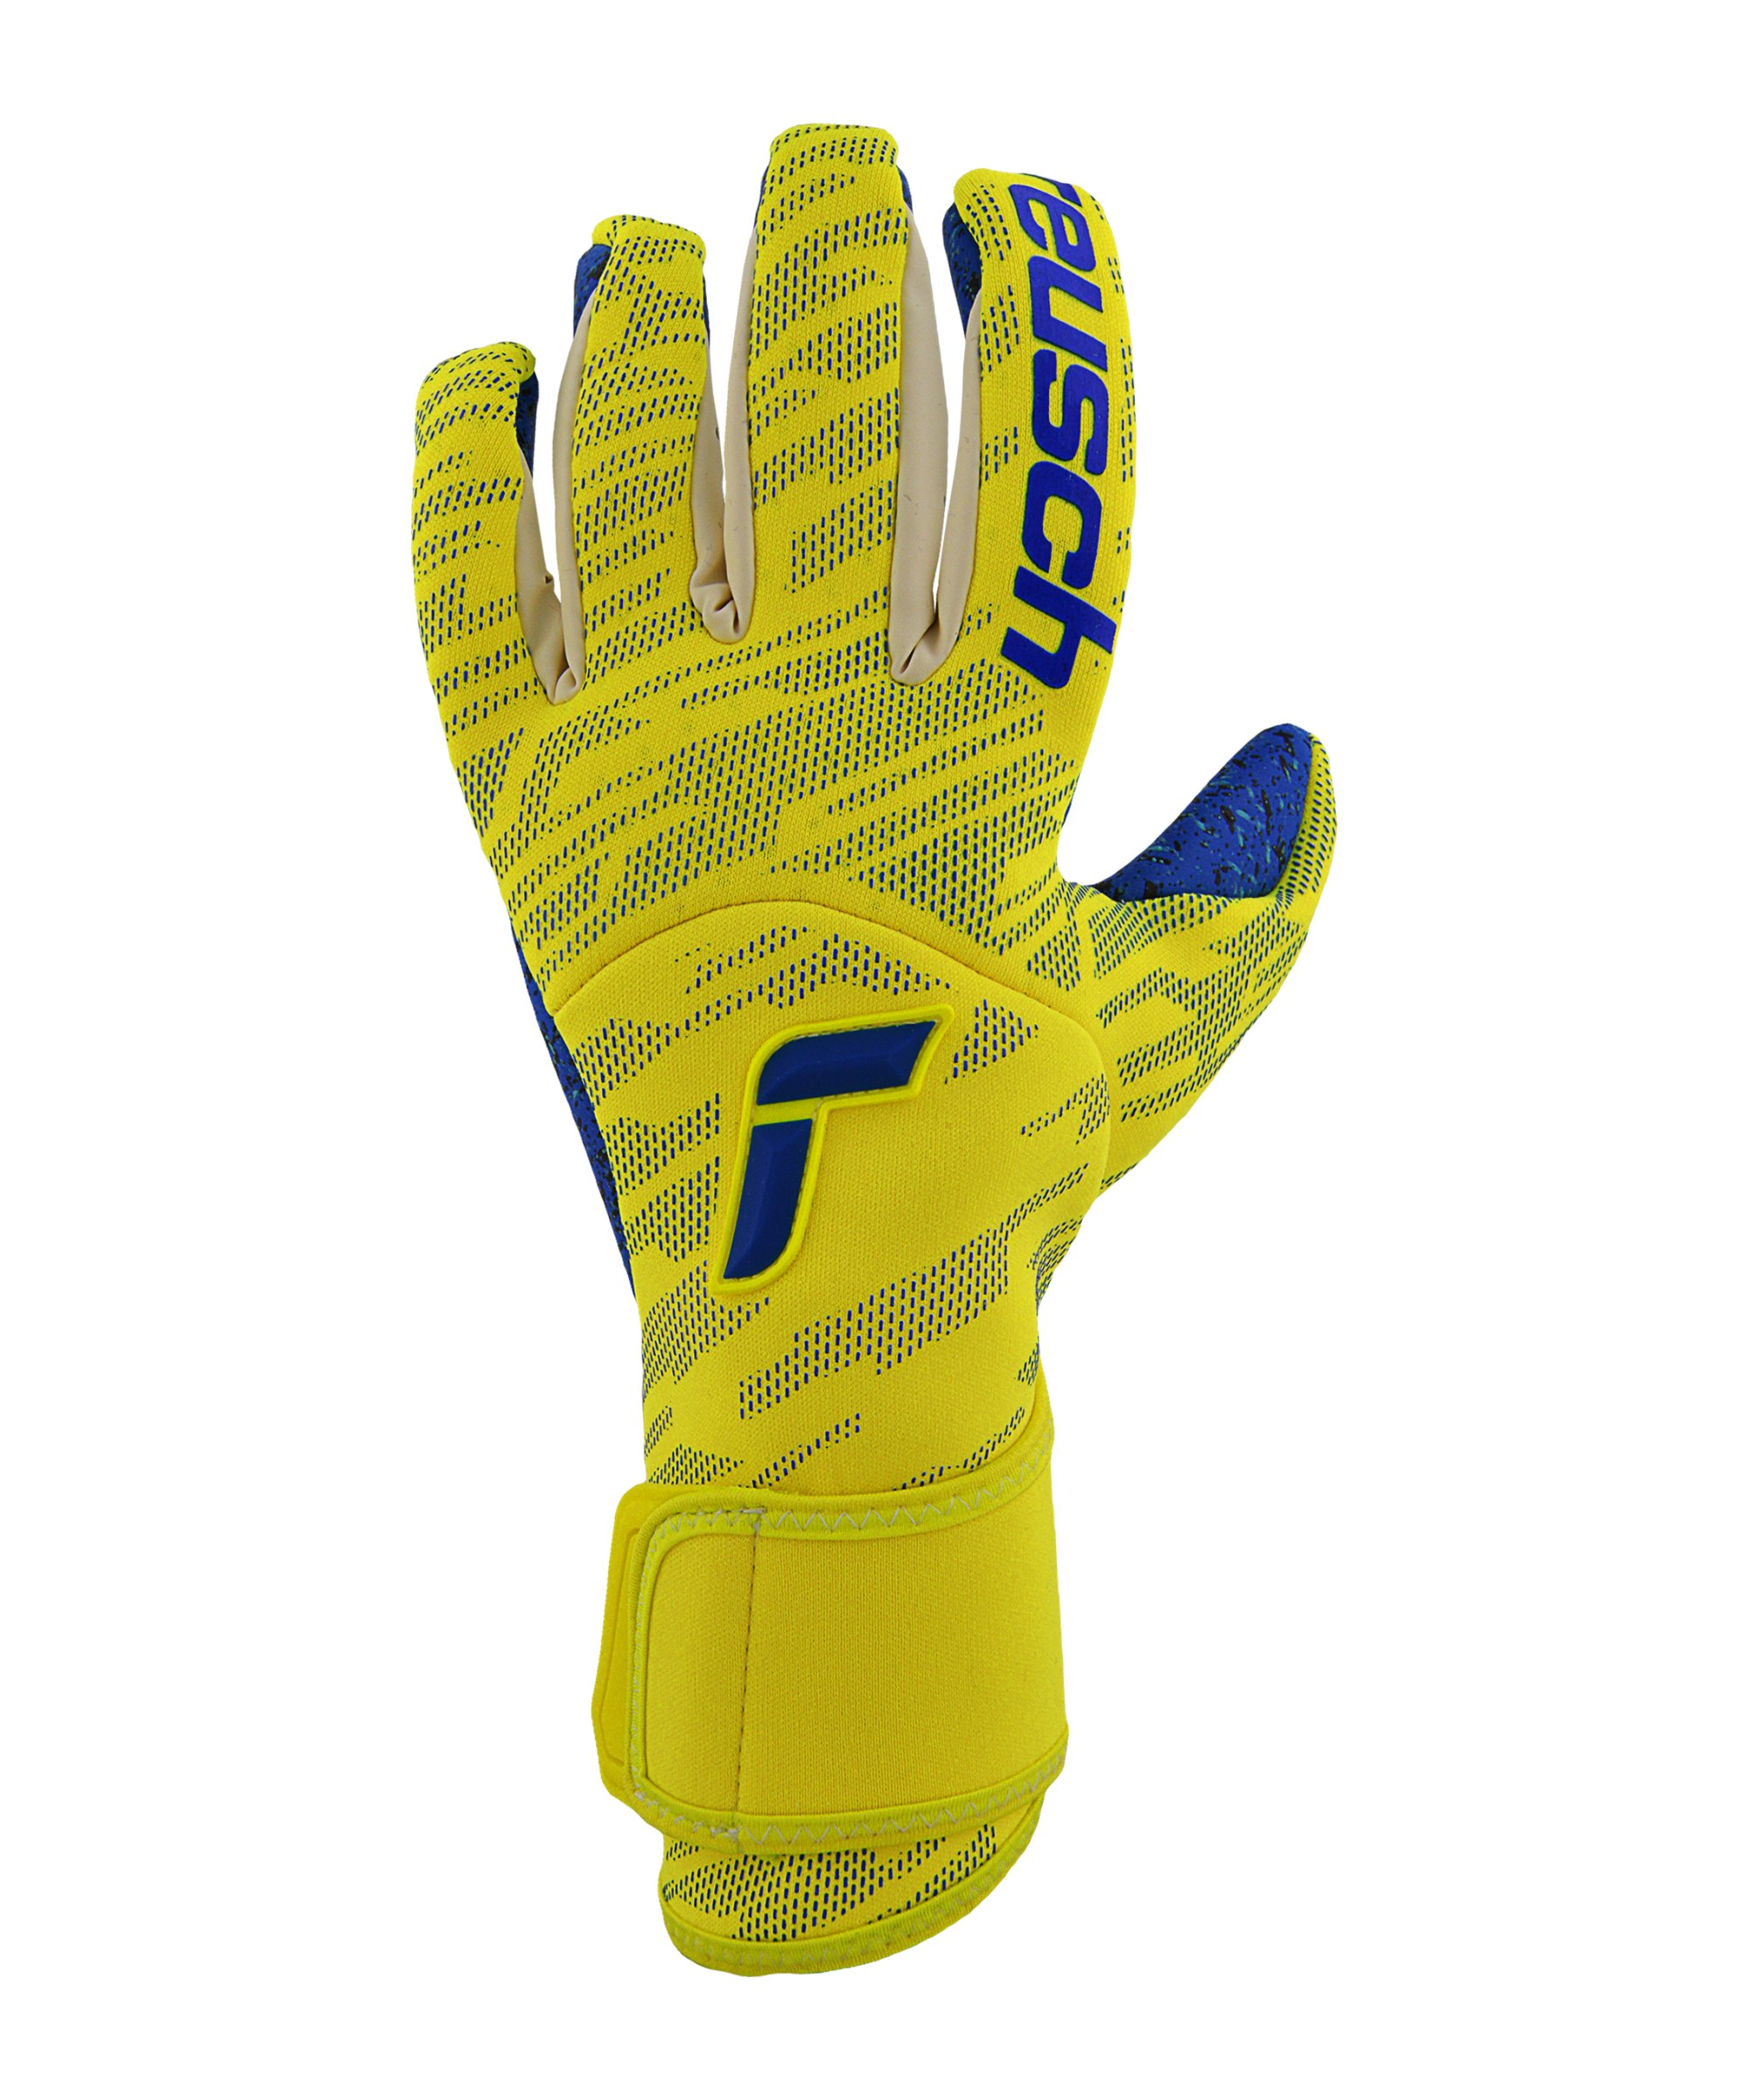 Reusch Pure Contact Fusion TW-Handschuh F2199 - gelb